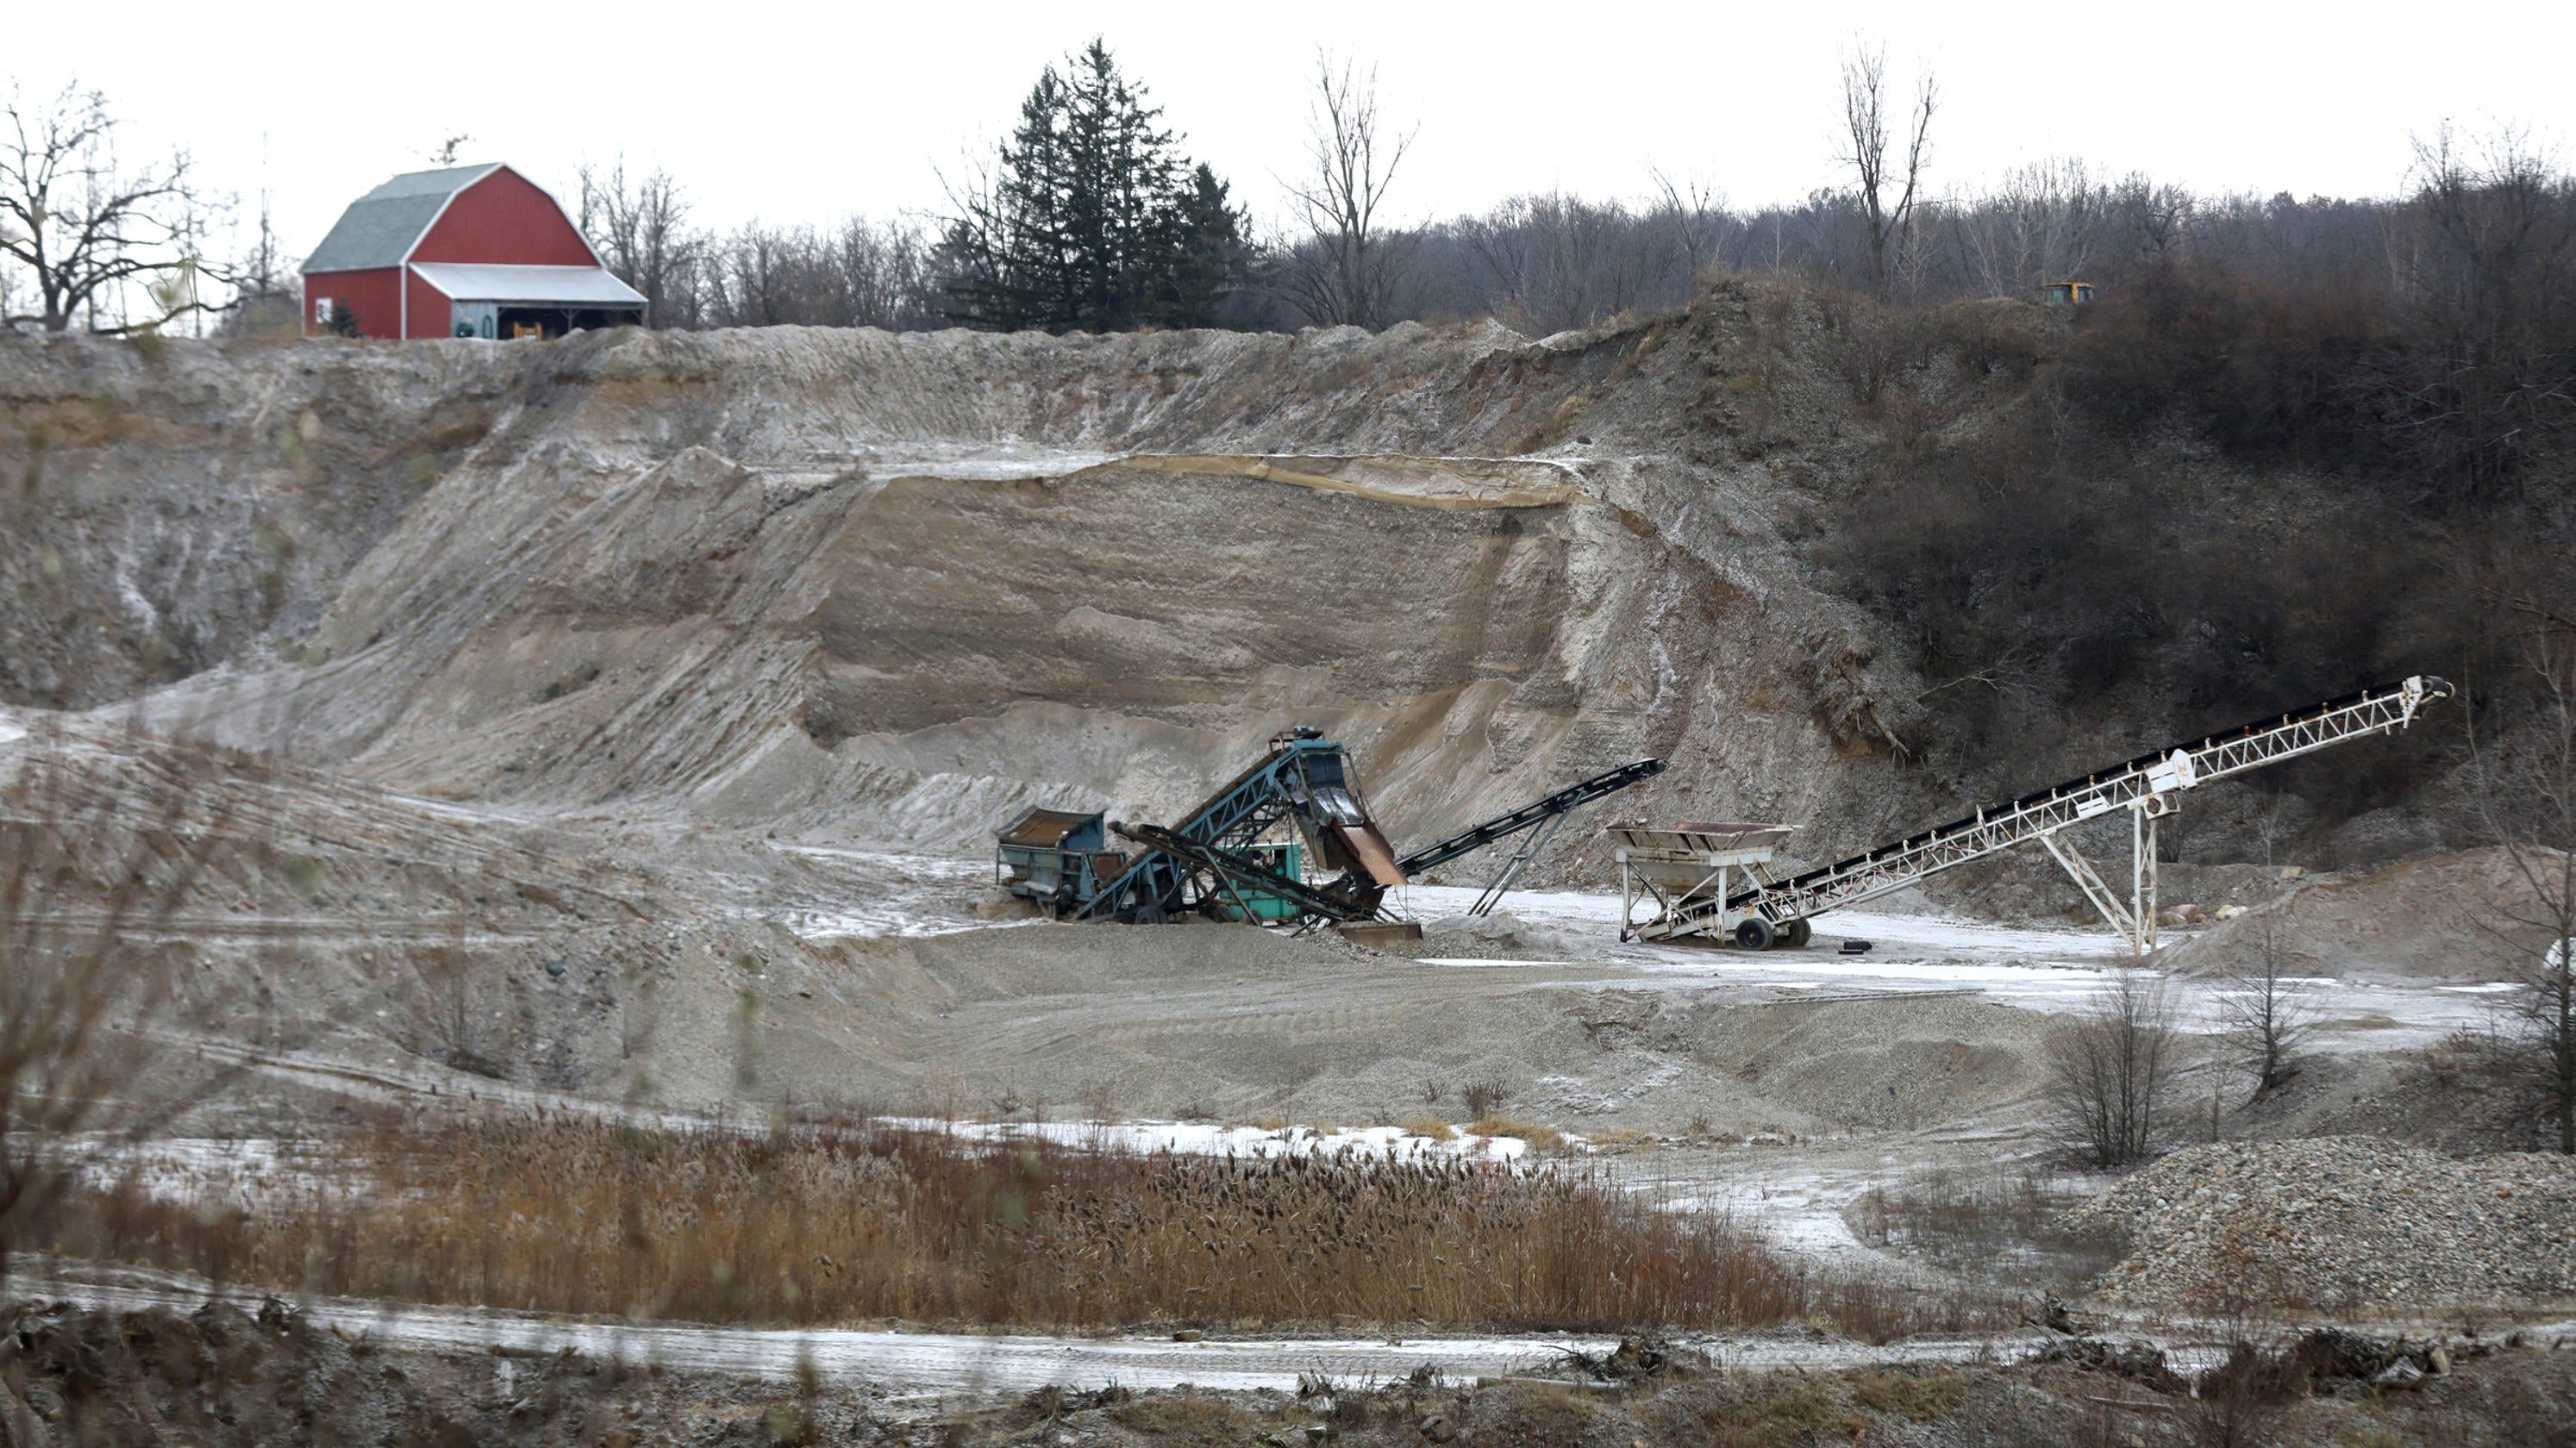 Gravel lobbyist steered MDOT report on gravel shortage